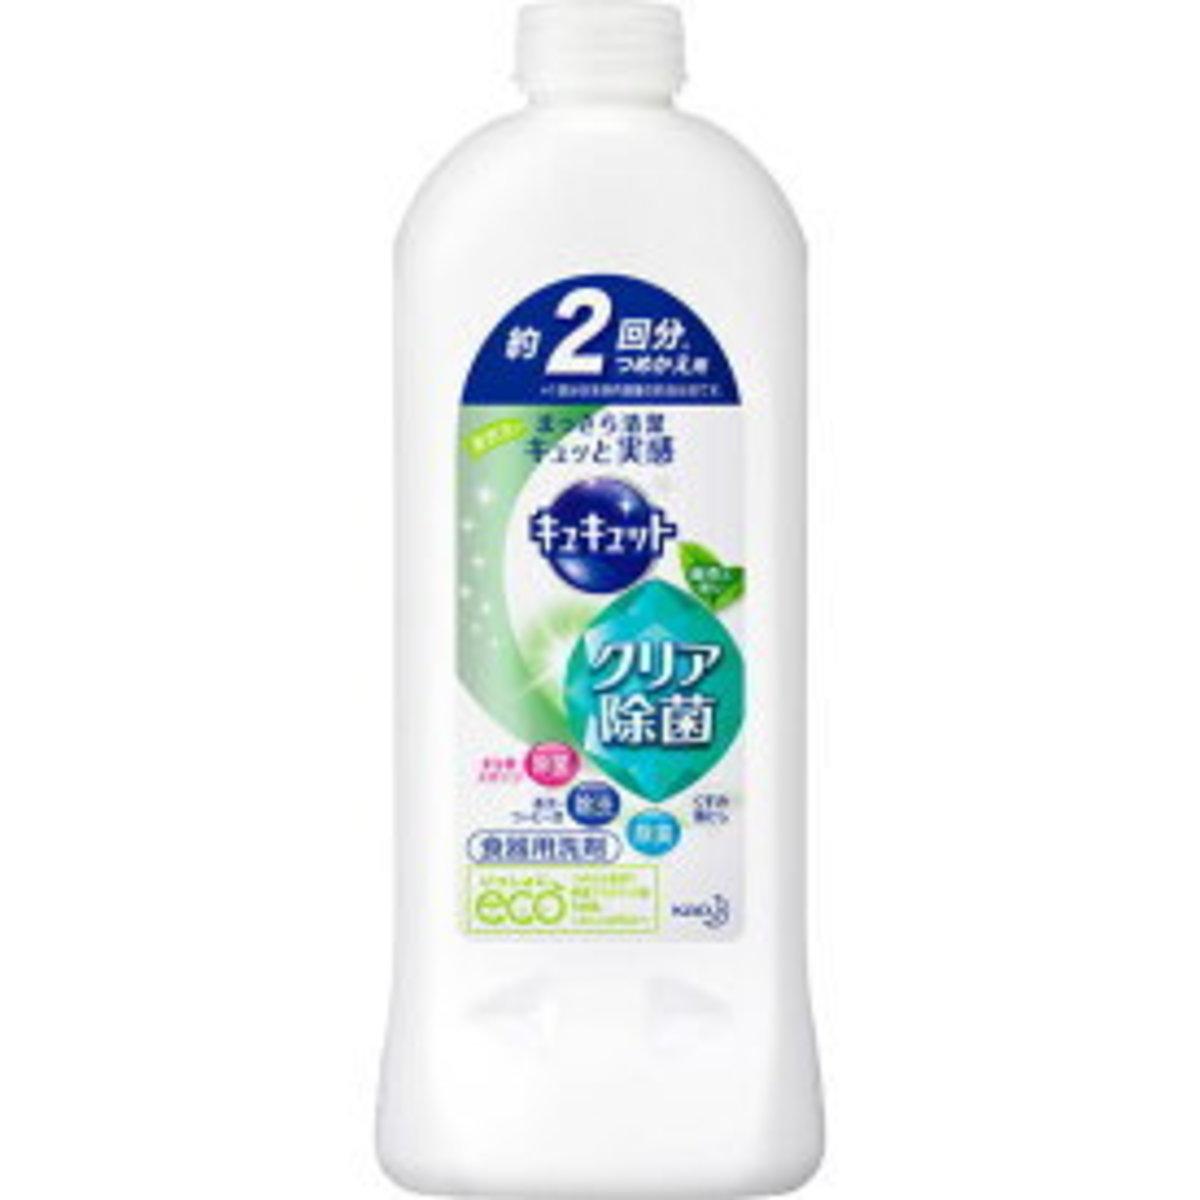 Cucute super-concentrated detergent sterilization (green tea incense) 385ml supplement village